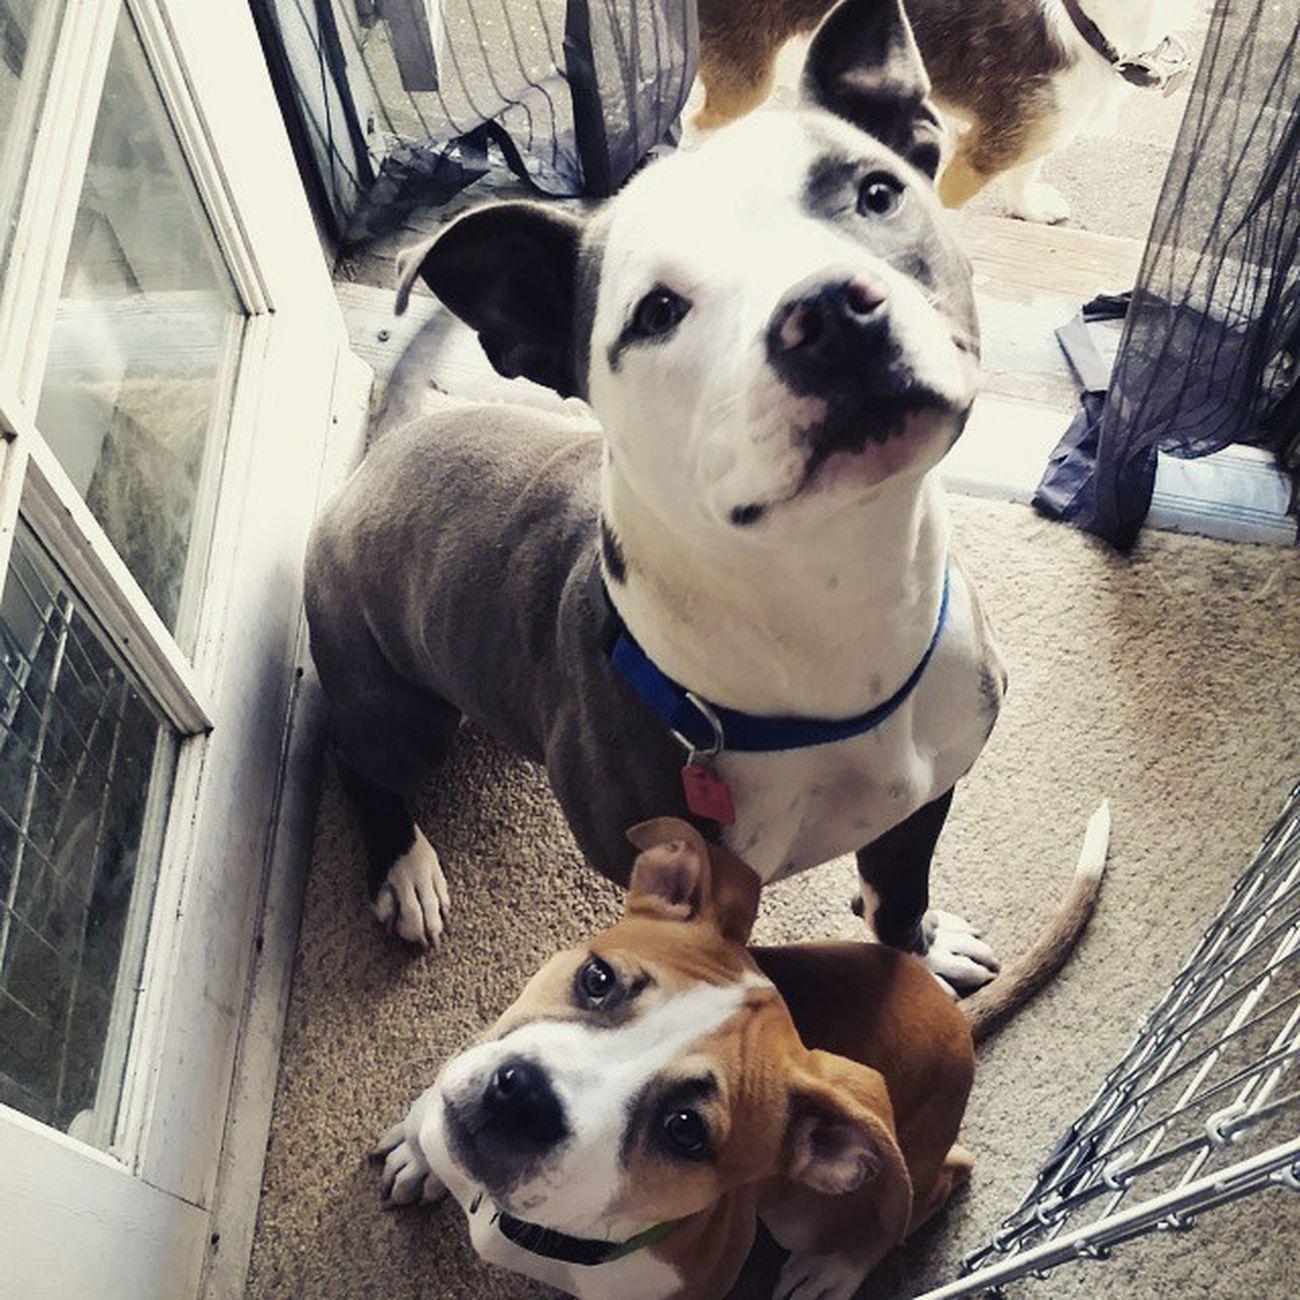 BaBr Bayareabulliesrescue foster pups amos and burrito